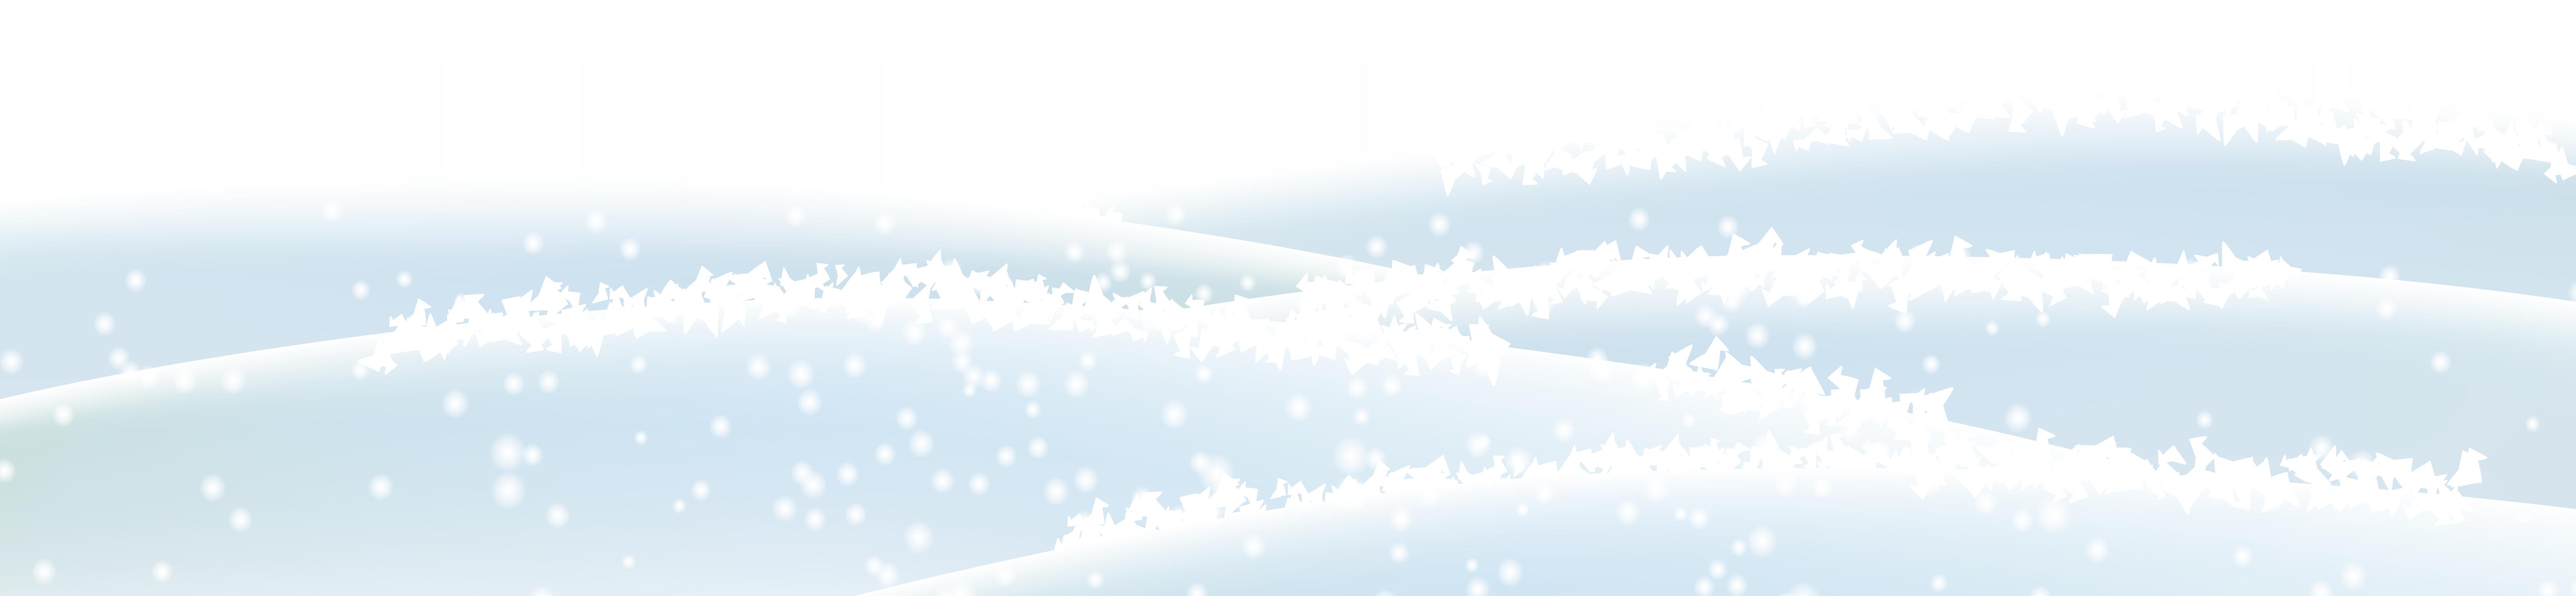 Lake clipart ground. Winter snow clip art